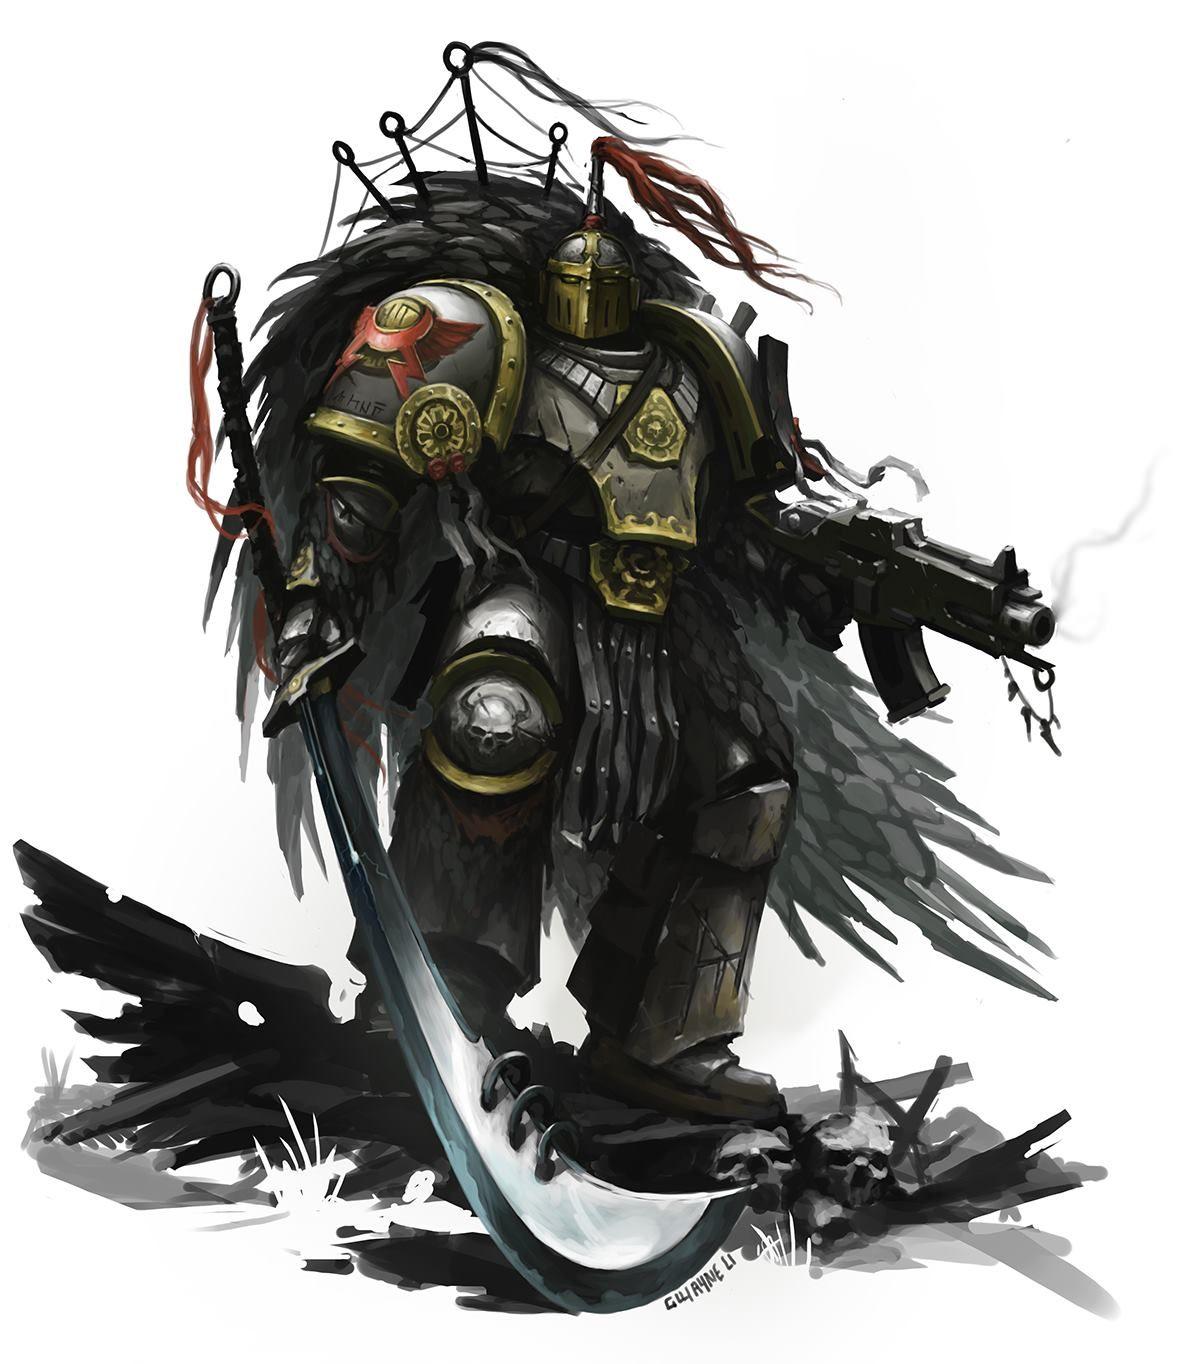 Steppe Snakes By Gwayne Li In 2020 Space Marine Art Warhammer 40000 Warhammer Art